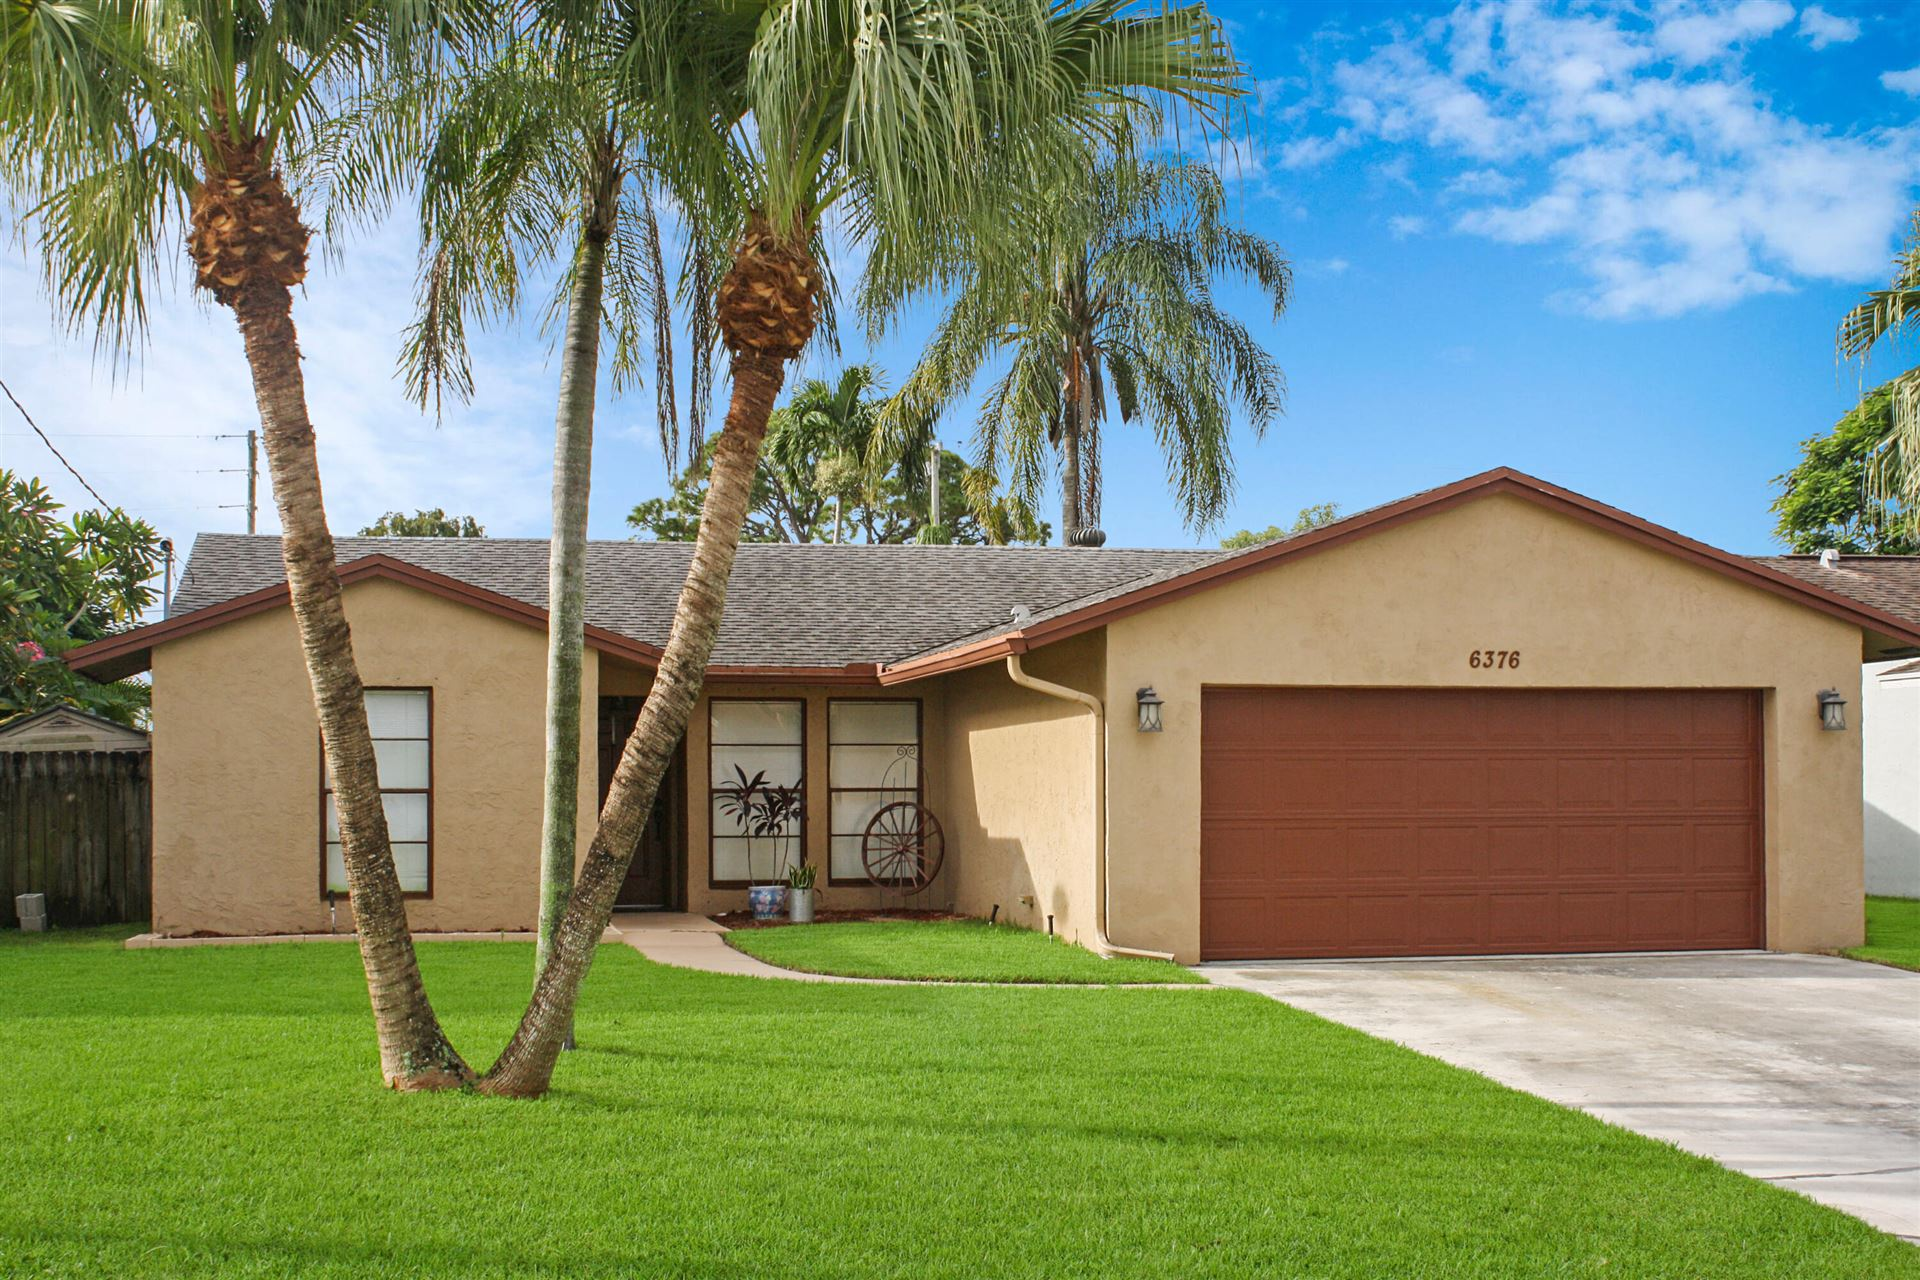 Photo of 6376 Foster Street, Jupiter, FL 33458 (MLS # RX-10747181)